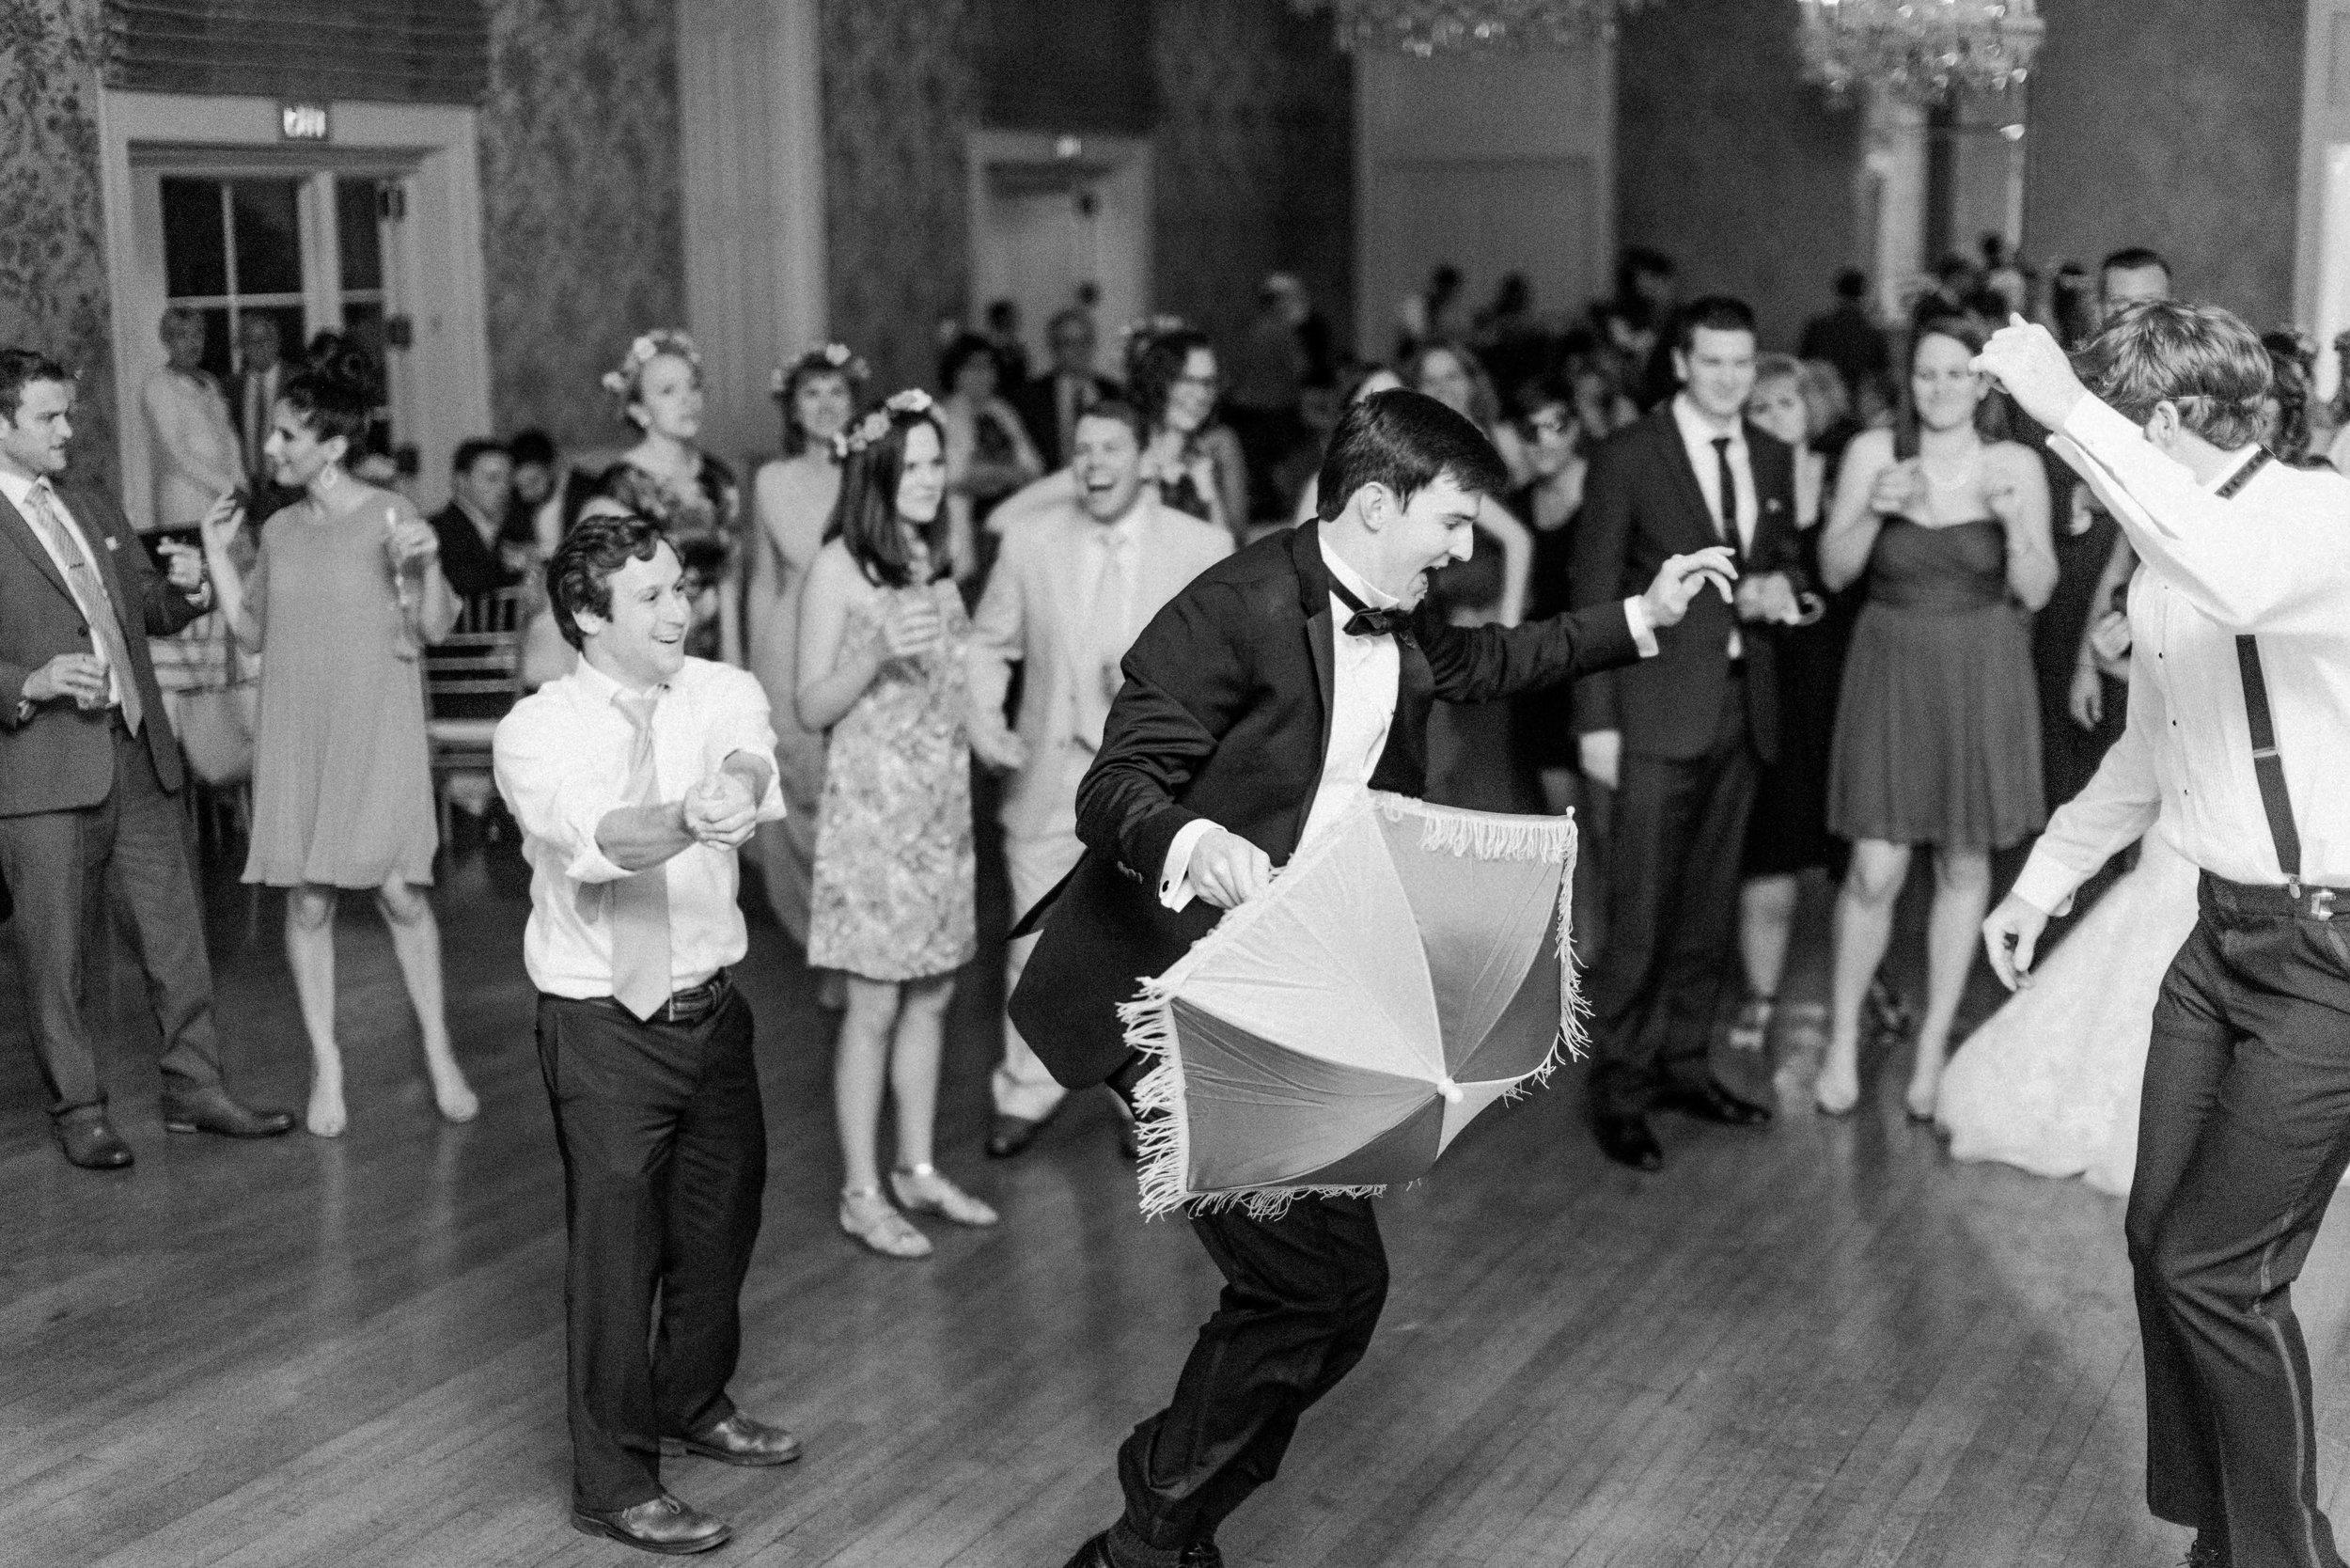 St.-Philip-Presbyterian-Church-Houston-Wedding-Ceremony-The-Junior-League-Of-Houston-Reception-Dana-Fernandez-Photography-Fine-Art-Film-33.jpg